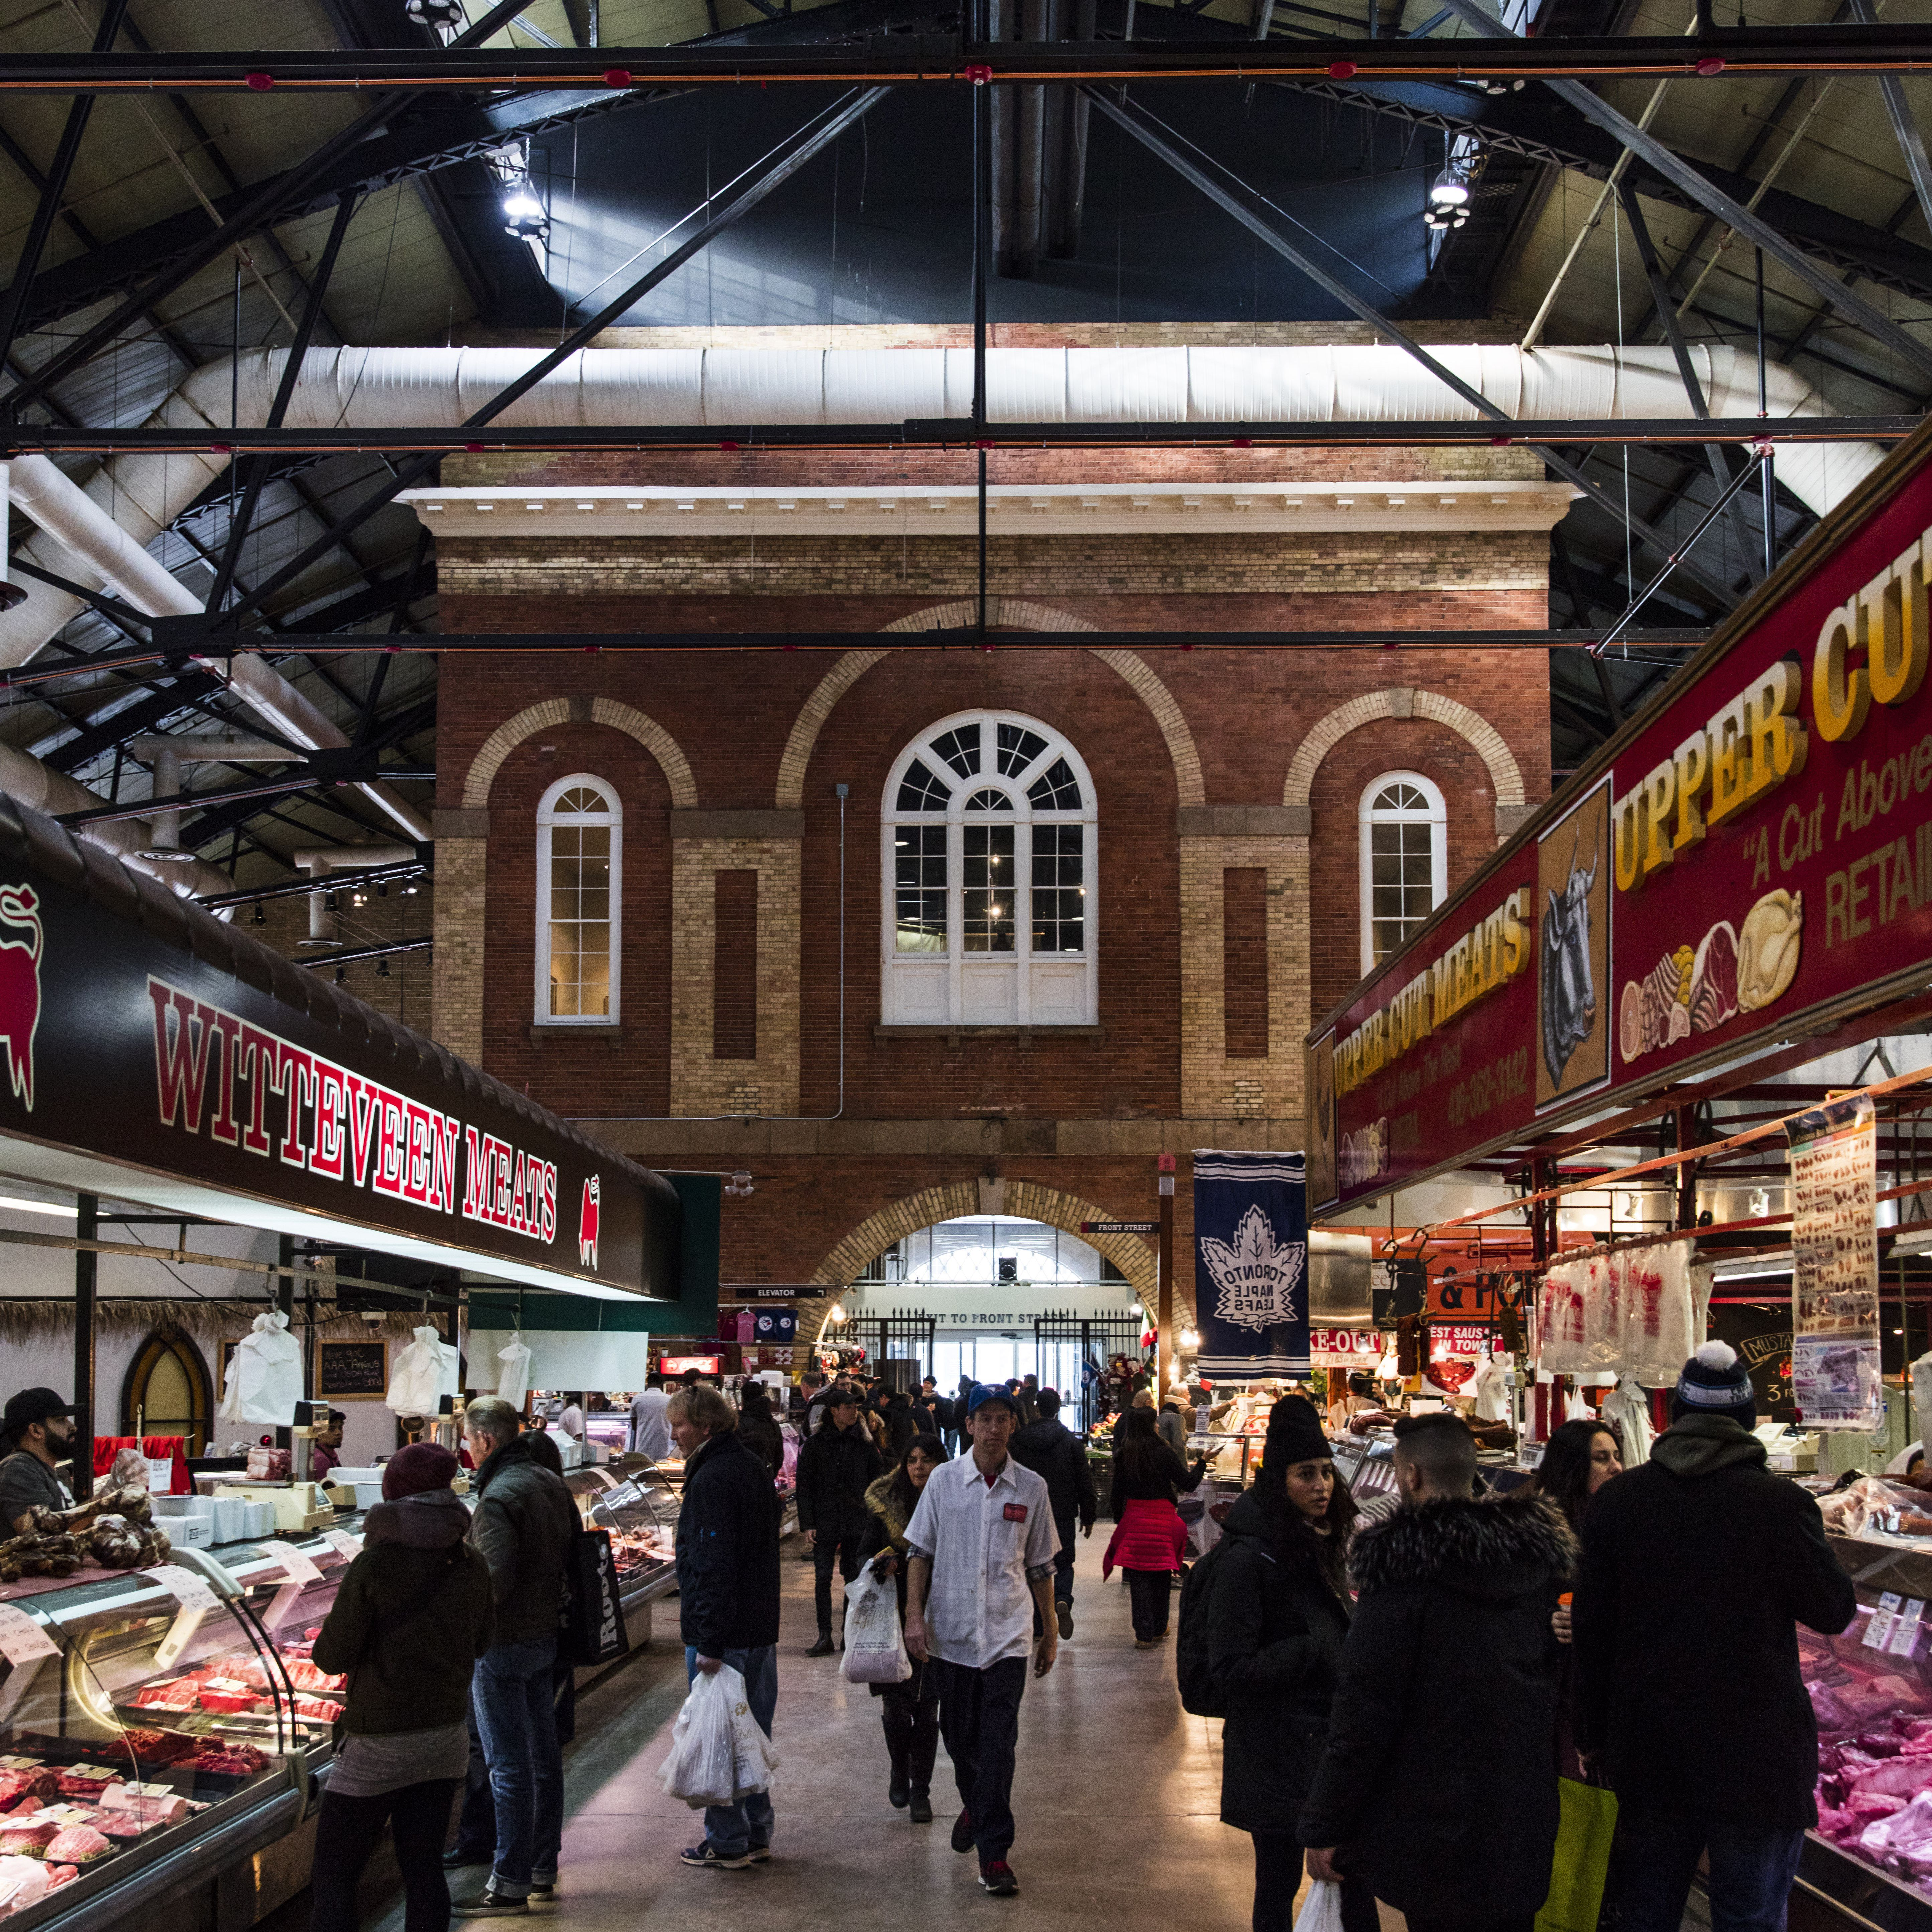 Inside the St Lawrence Market